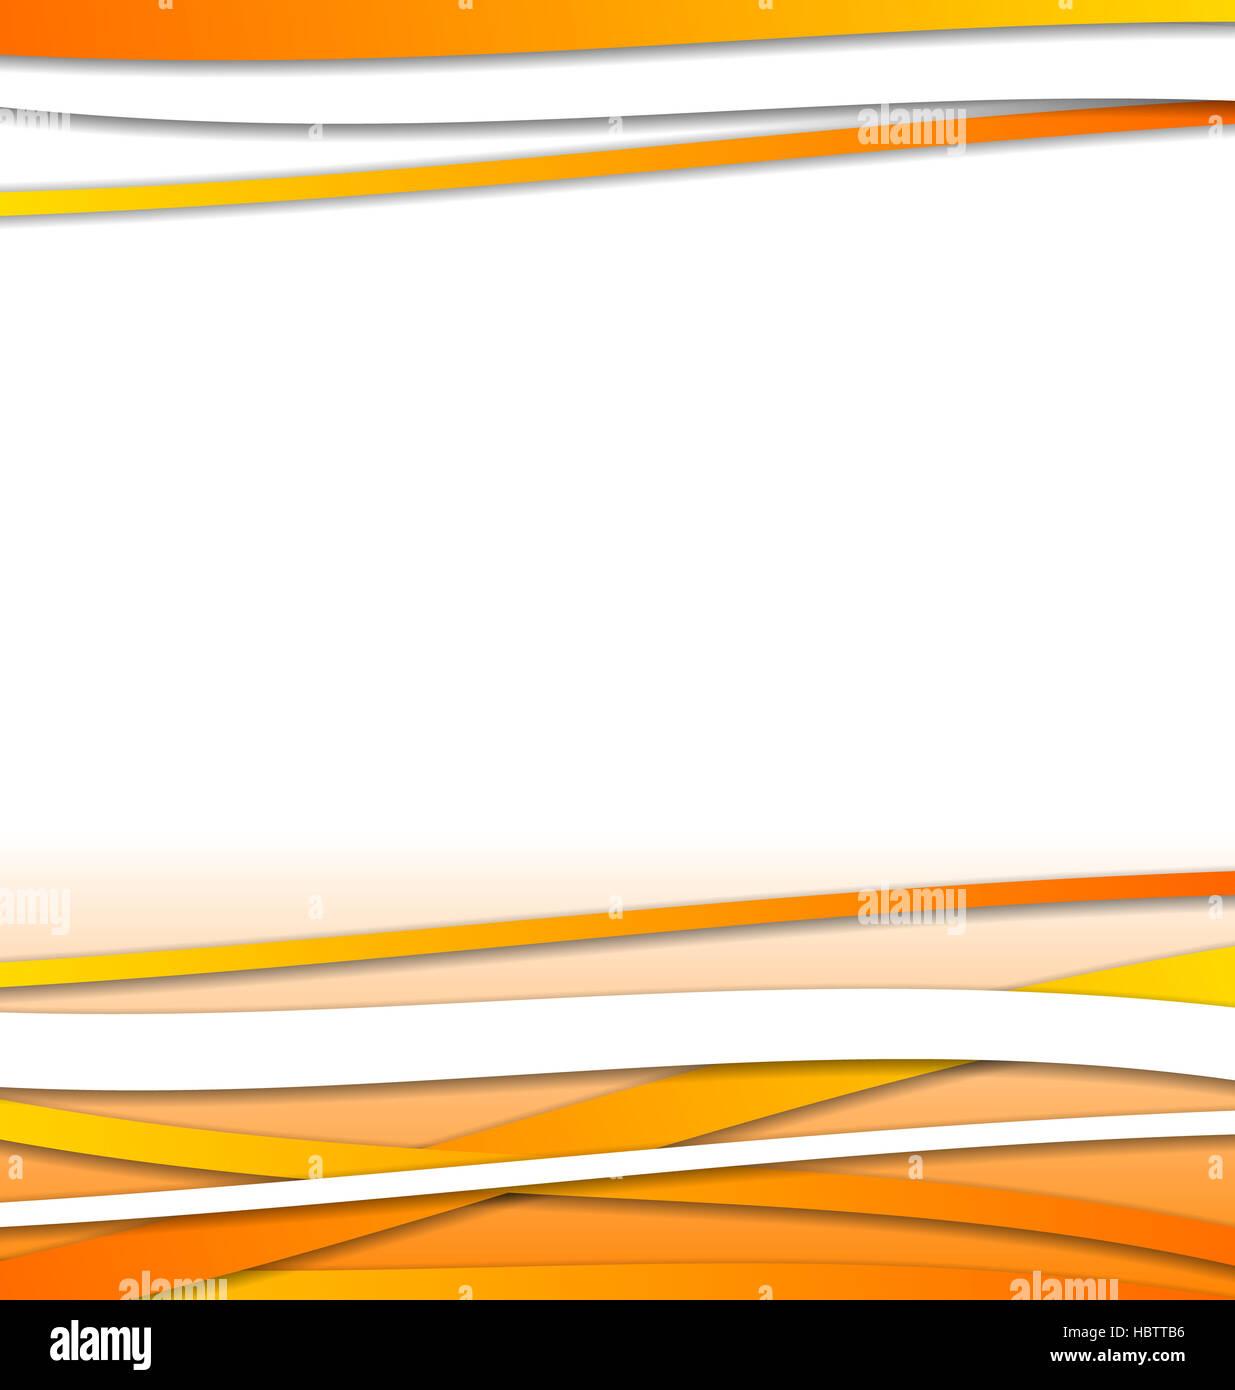 Orange Futuristic Background Curve Lines Stockfotos & Orange ...